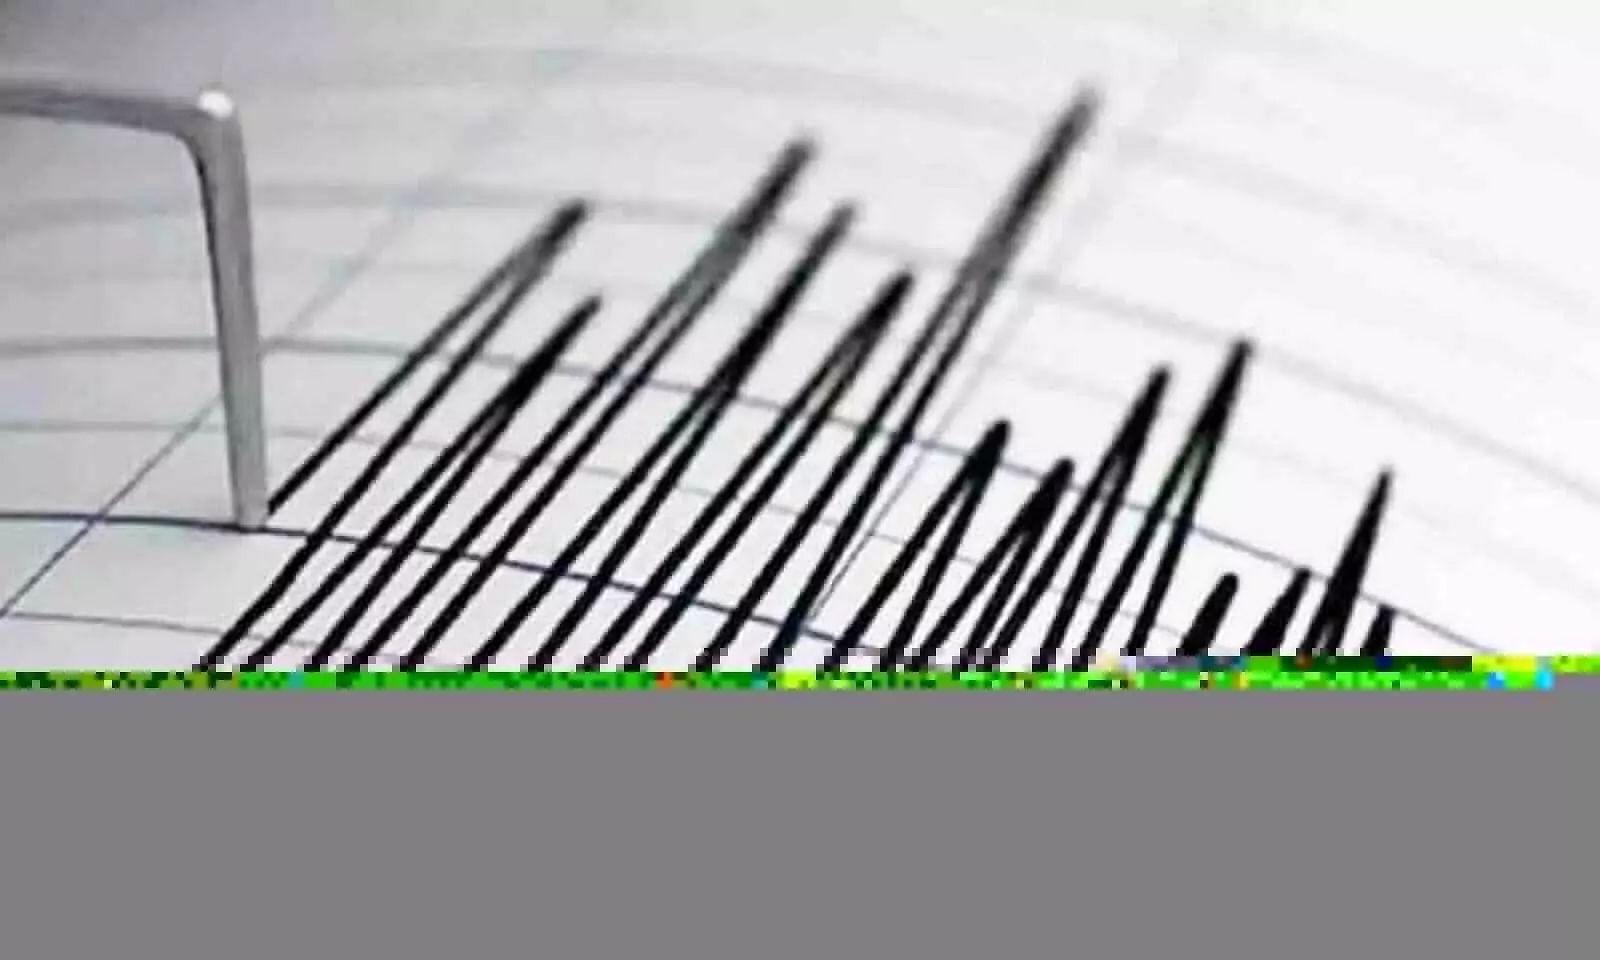 3.7 Magnitude Earthquake Jolts Sonitpur, Assam